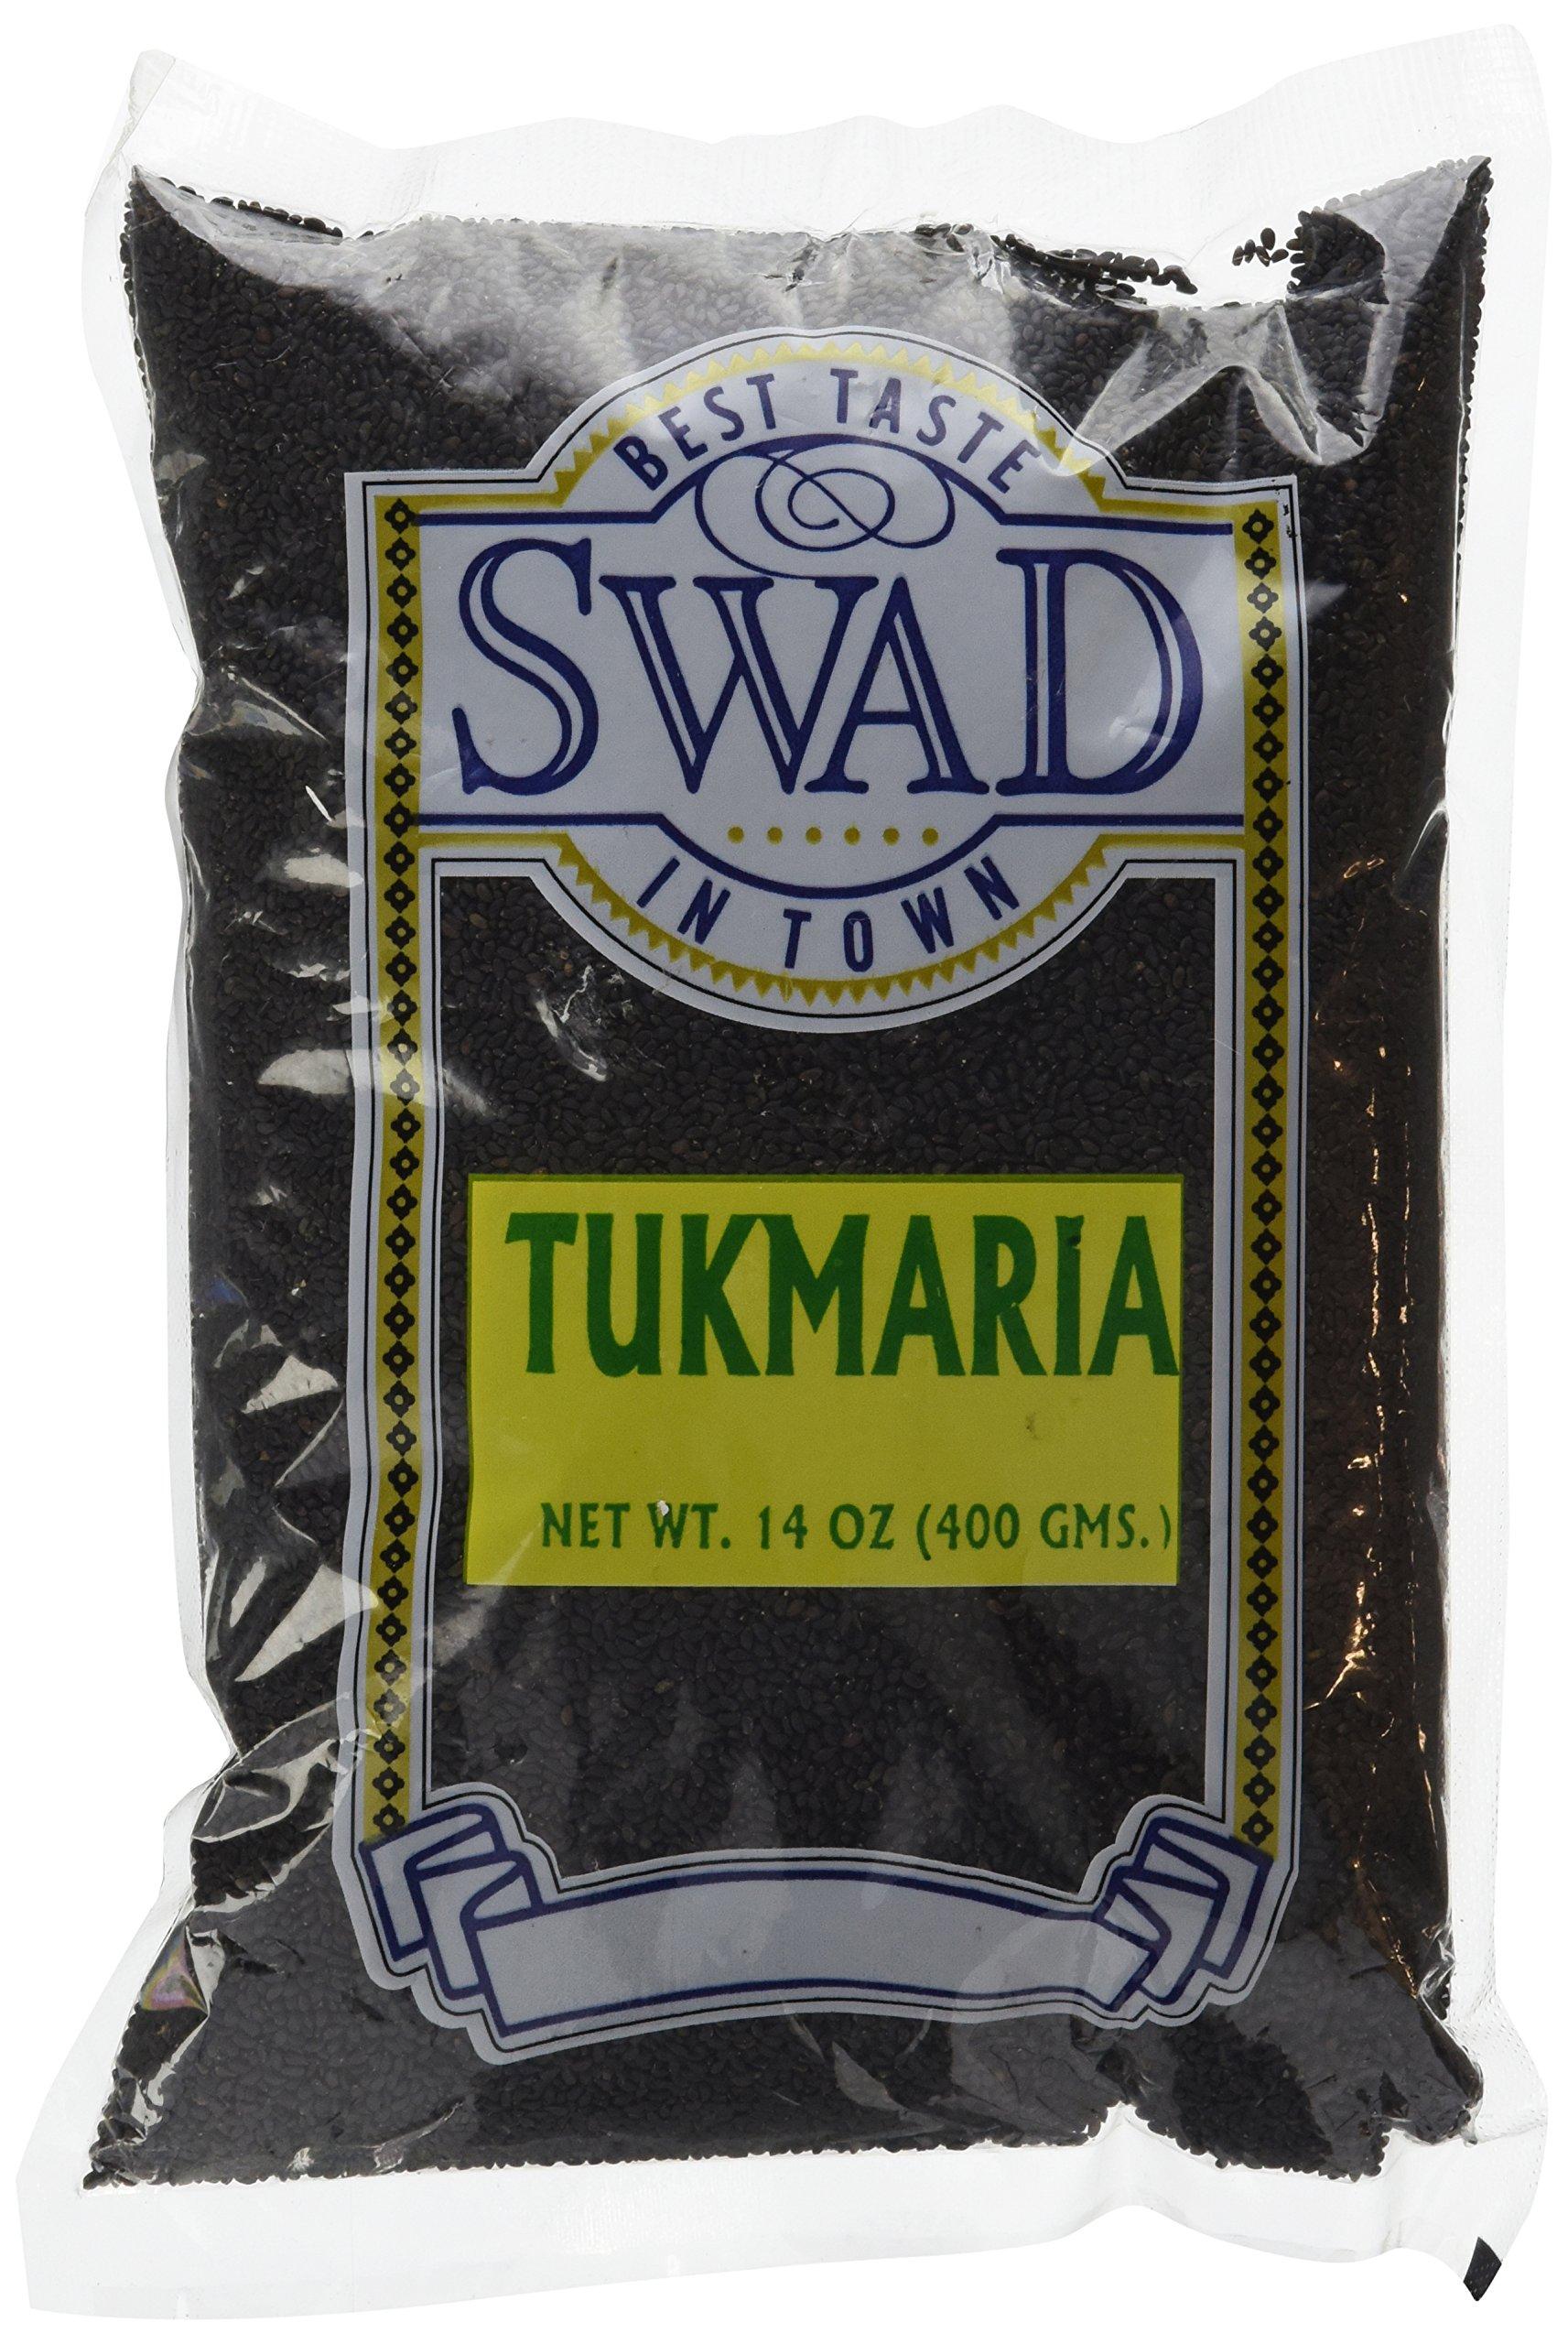 Swad 400gm Tukmaria Sacred Basil Seeds, 14Oz